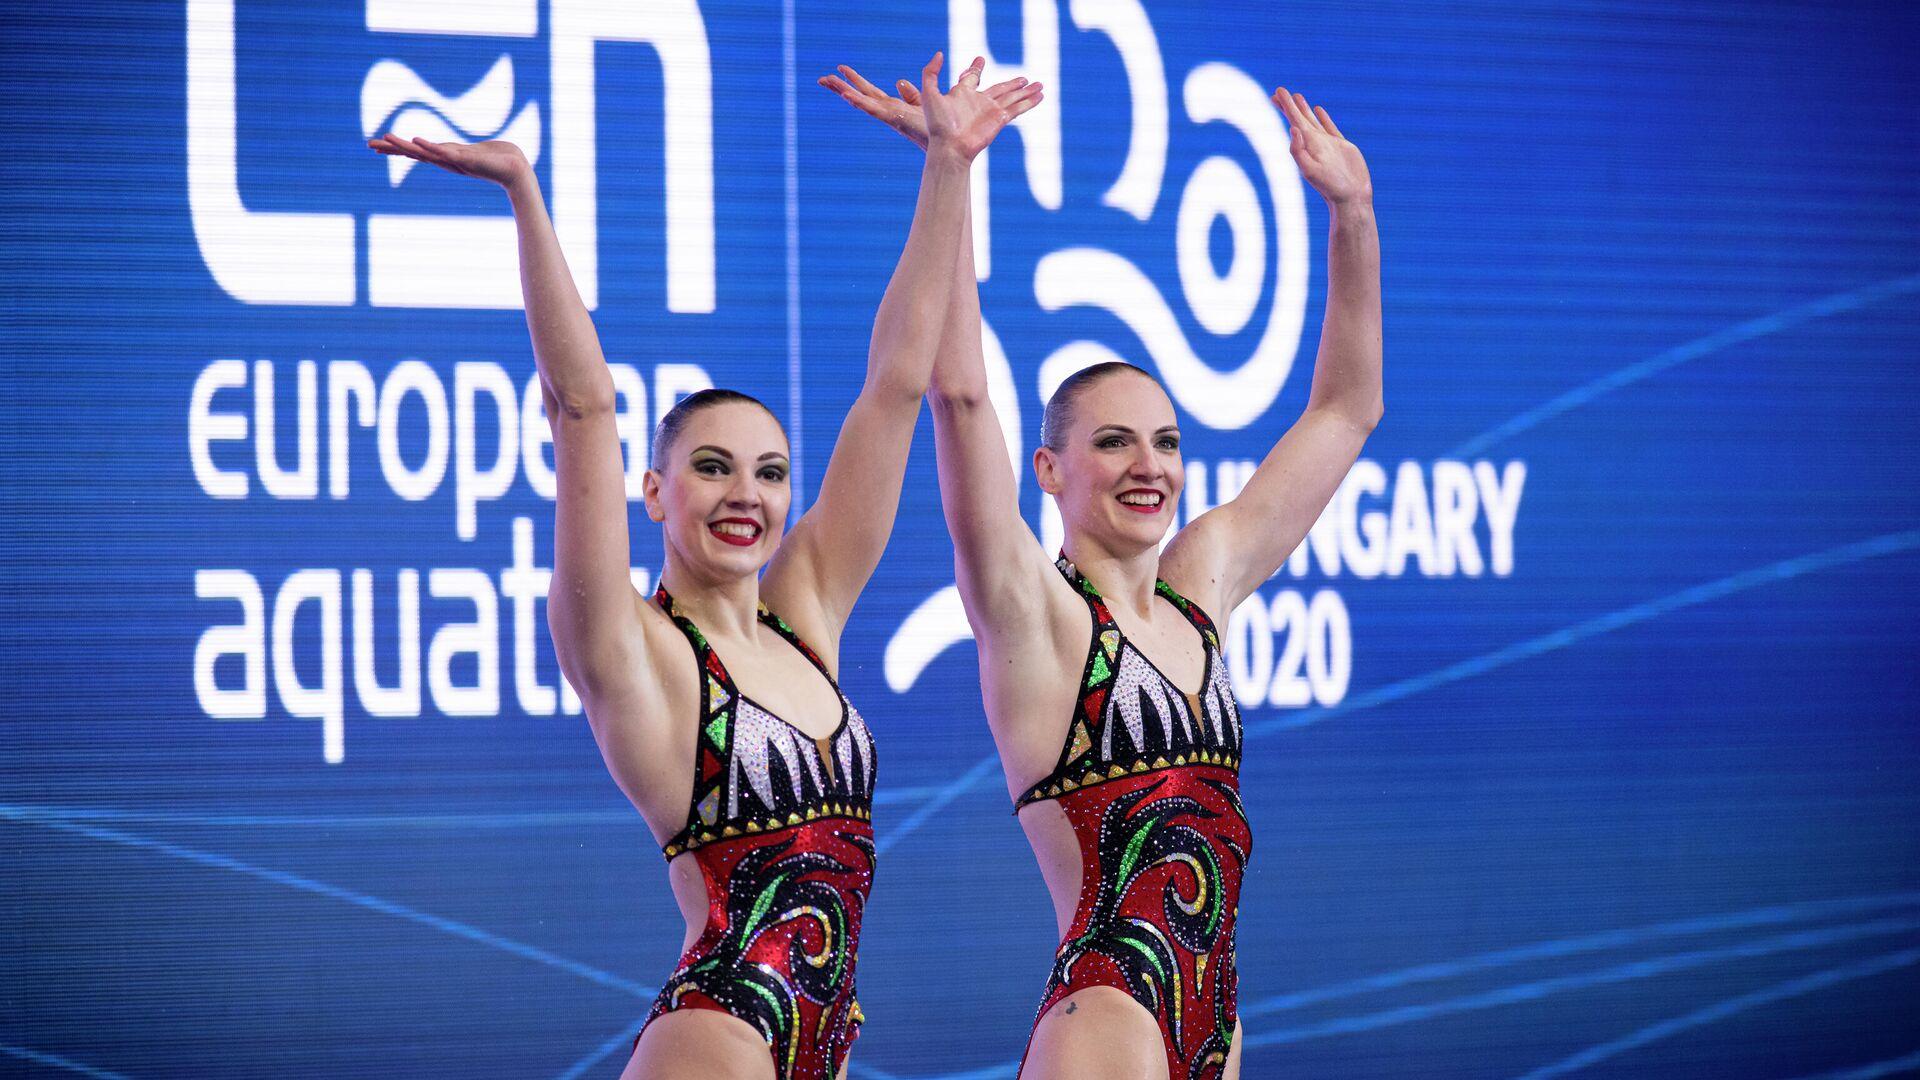 Светлана Колесниченко и Светлана Ромашина - РИА Новости, 1920, 13.05.2021